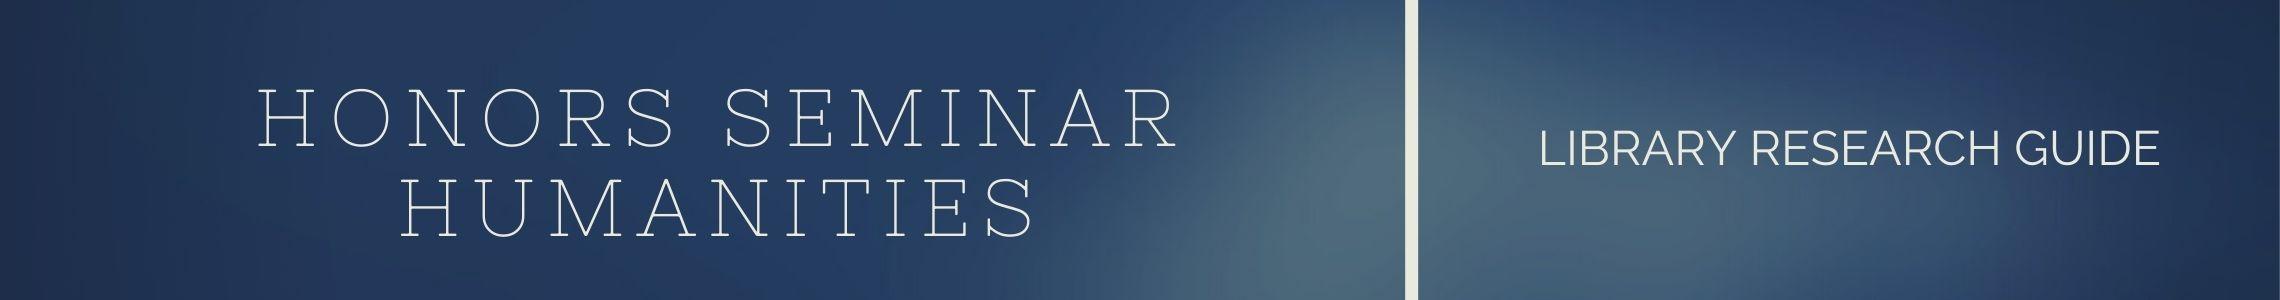 Honors seminar humanities library research guide